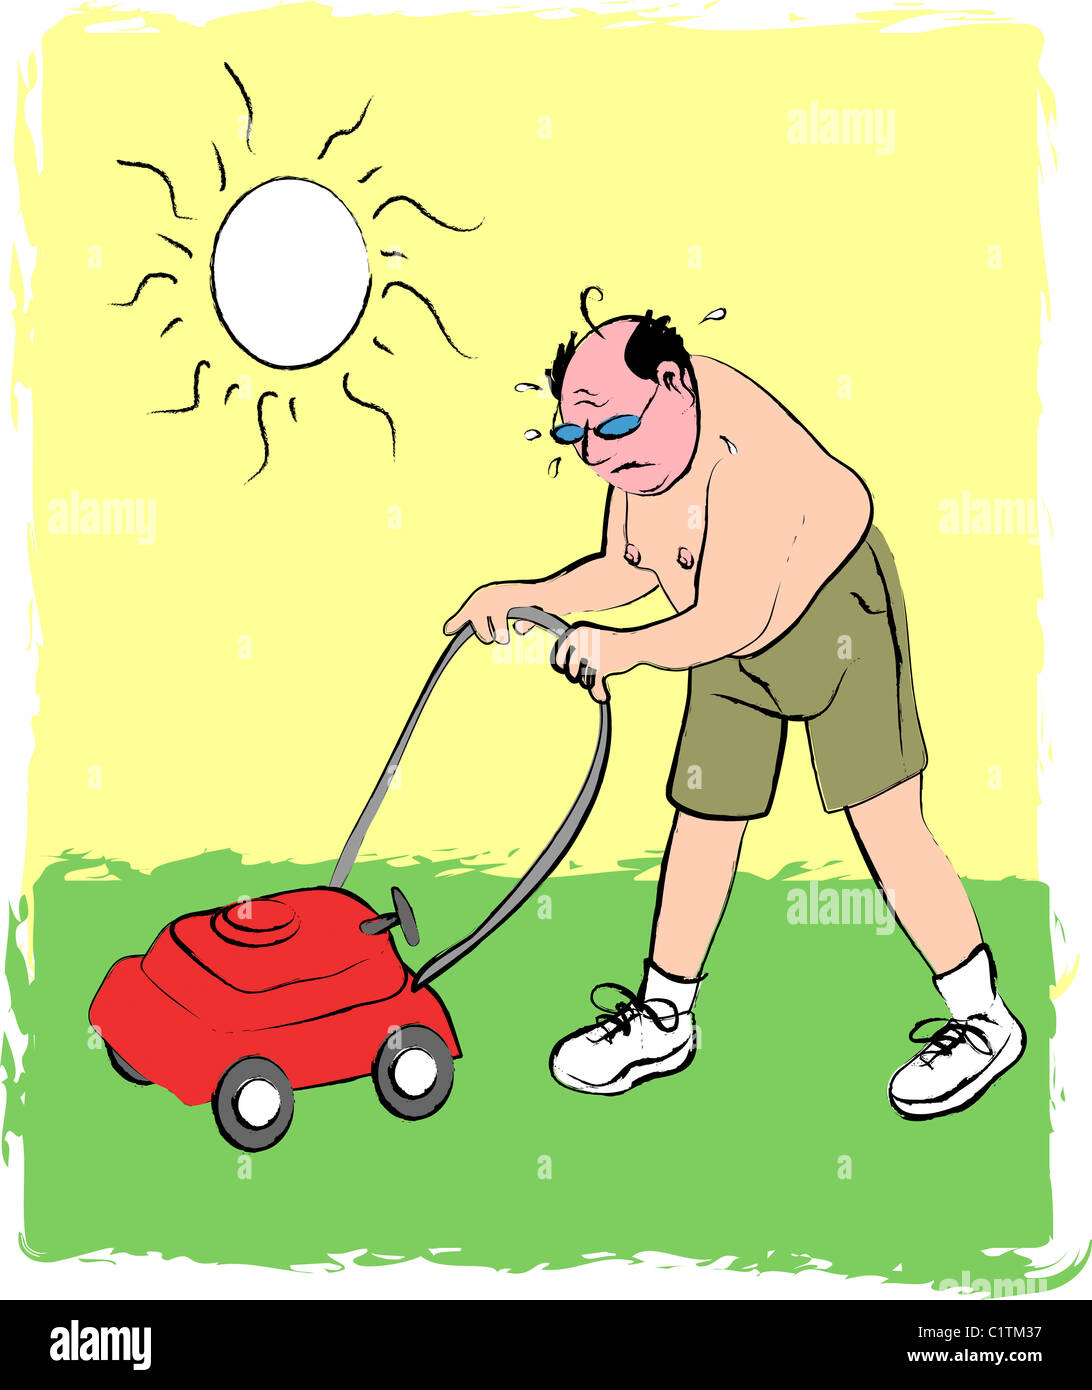 Mann Rasenmahen Abbildung Stockfoto Bild 35578011 Alamy